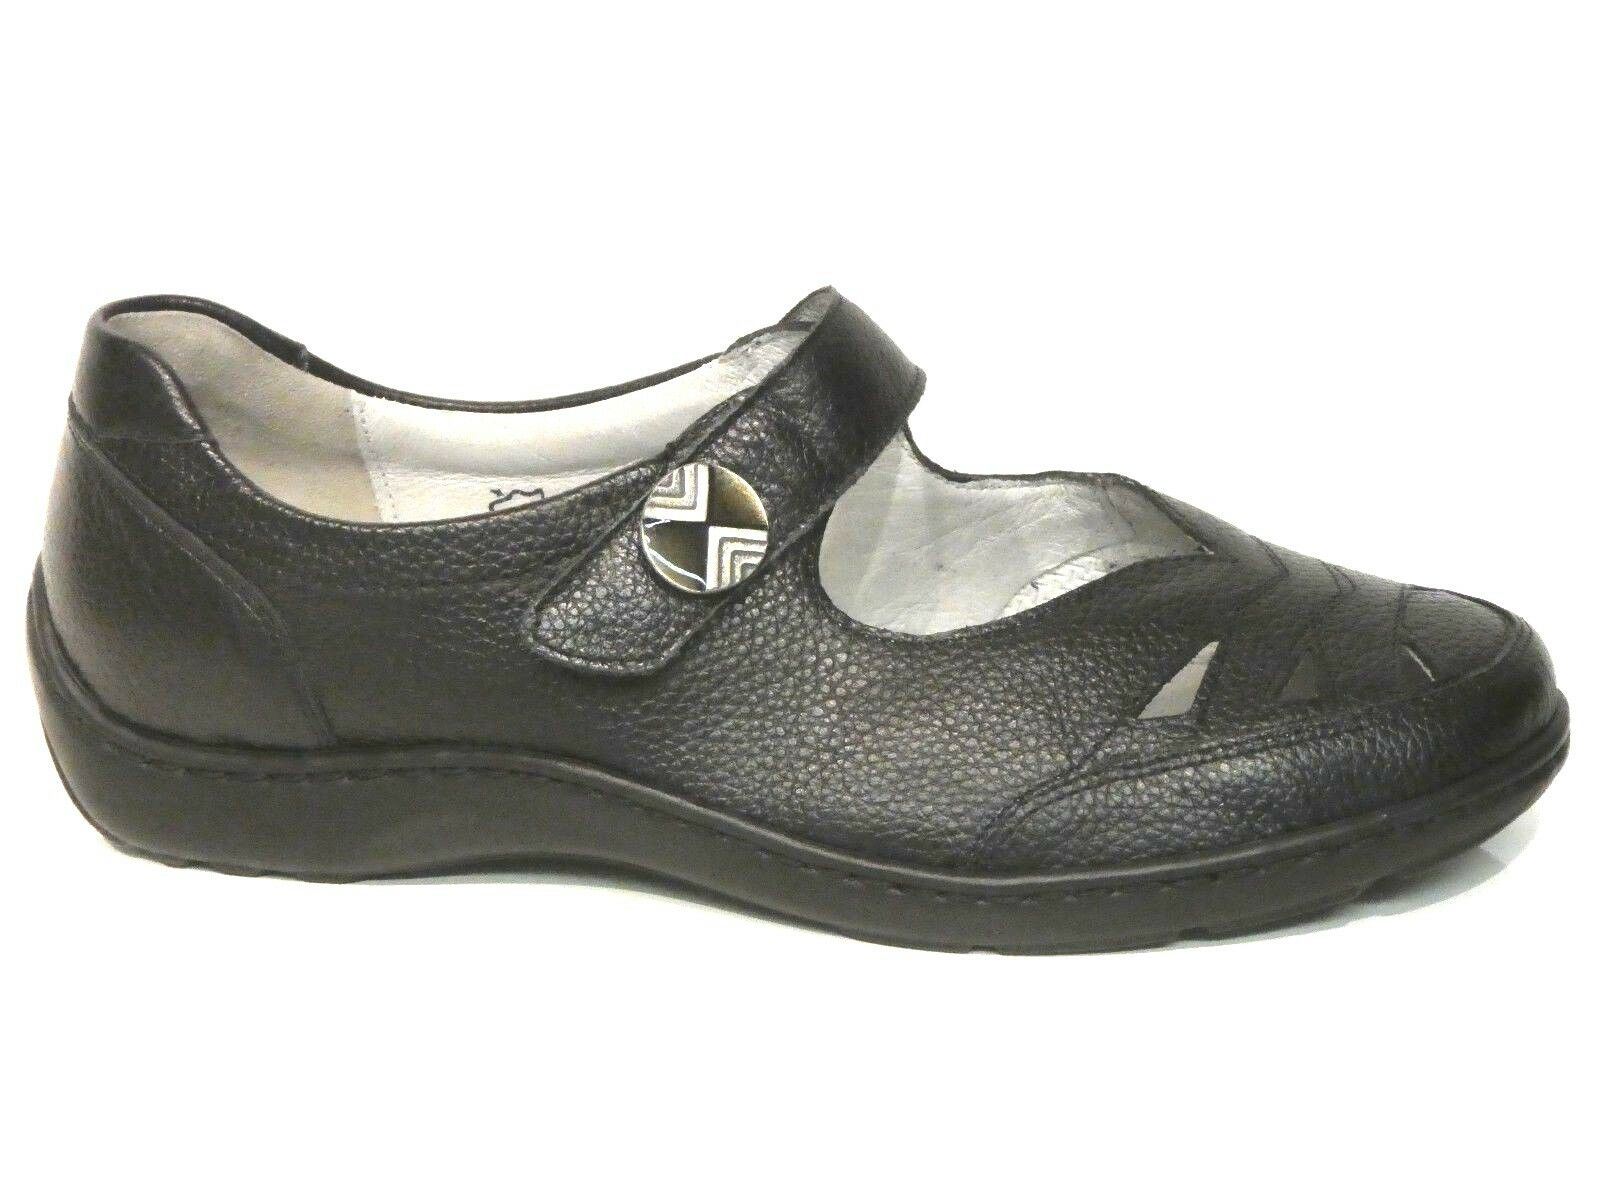 zu billig Schuhe Henni Slipper Ballerina schwarz Leder